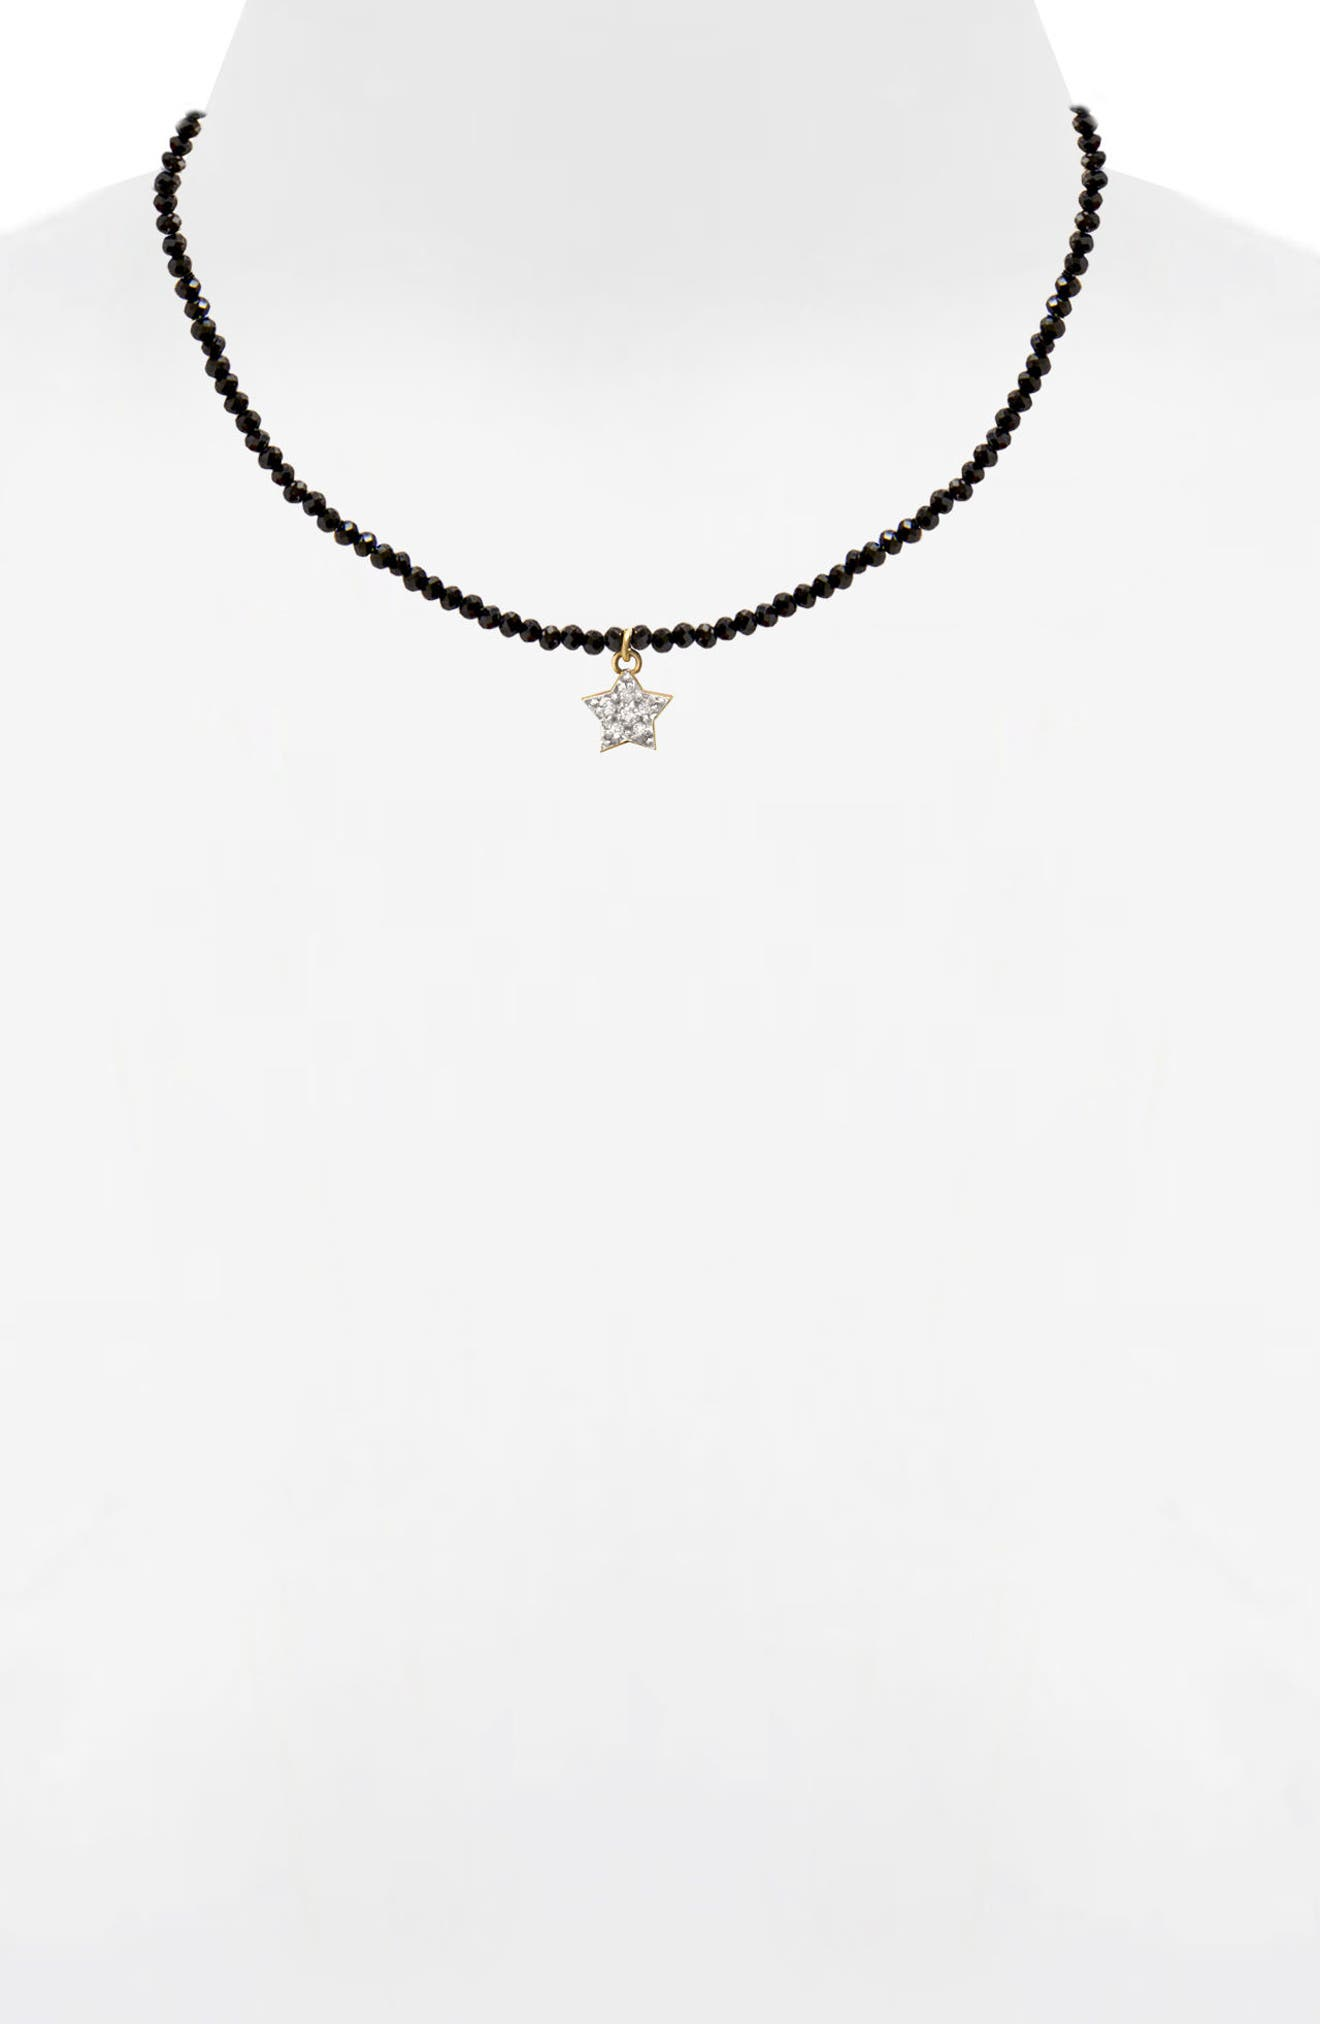 Jane Basch Diamond Star Necklace,                             Alternate thumbnail 2, color,                             Black Onyx